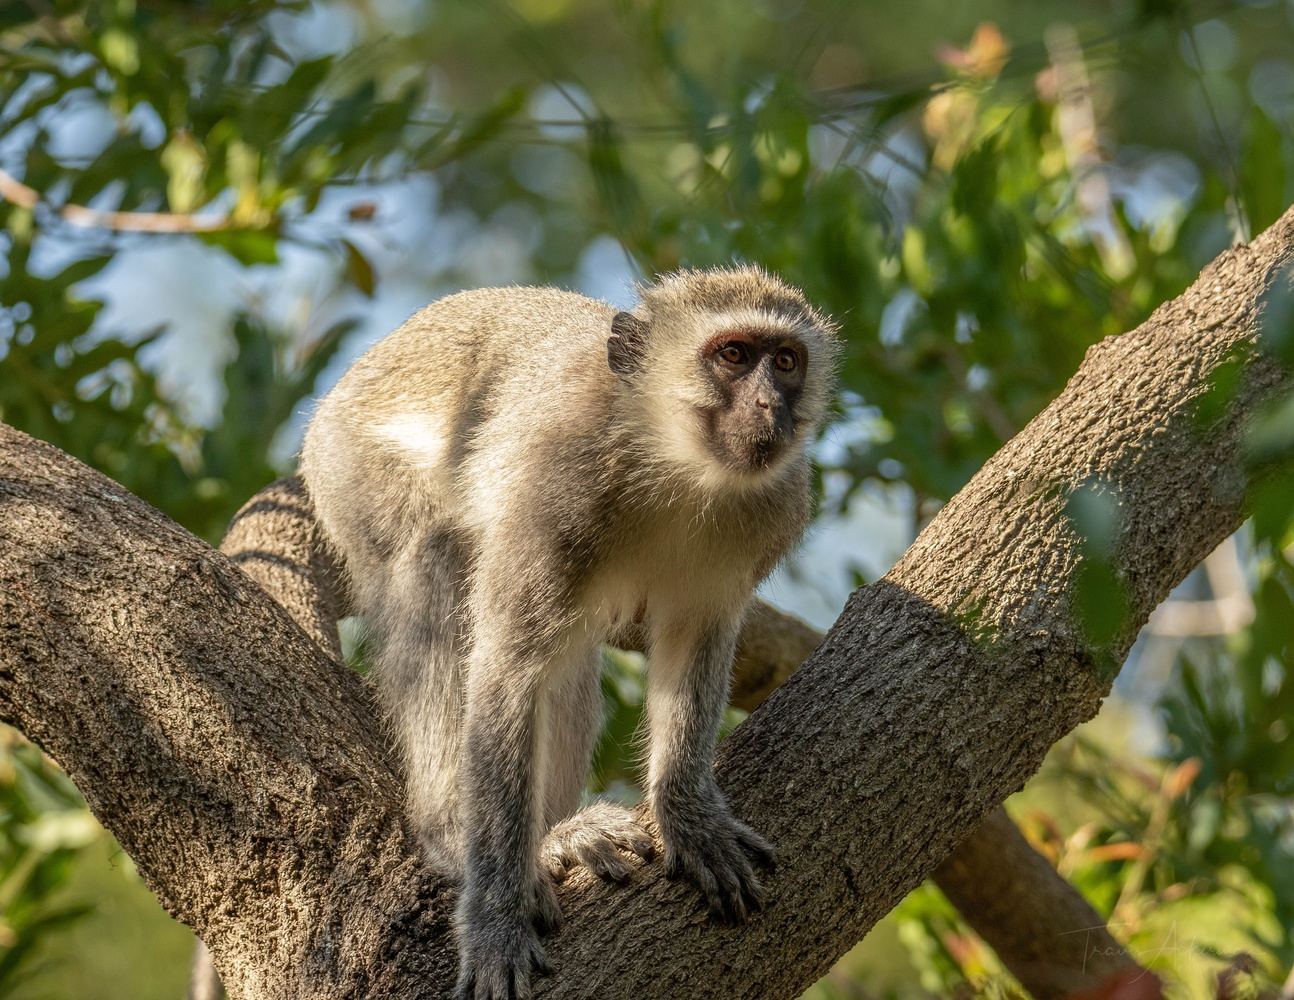 Vervet Monkey - South Africa by Travis Ackerman